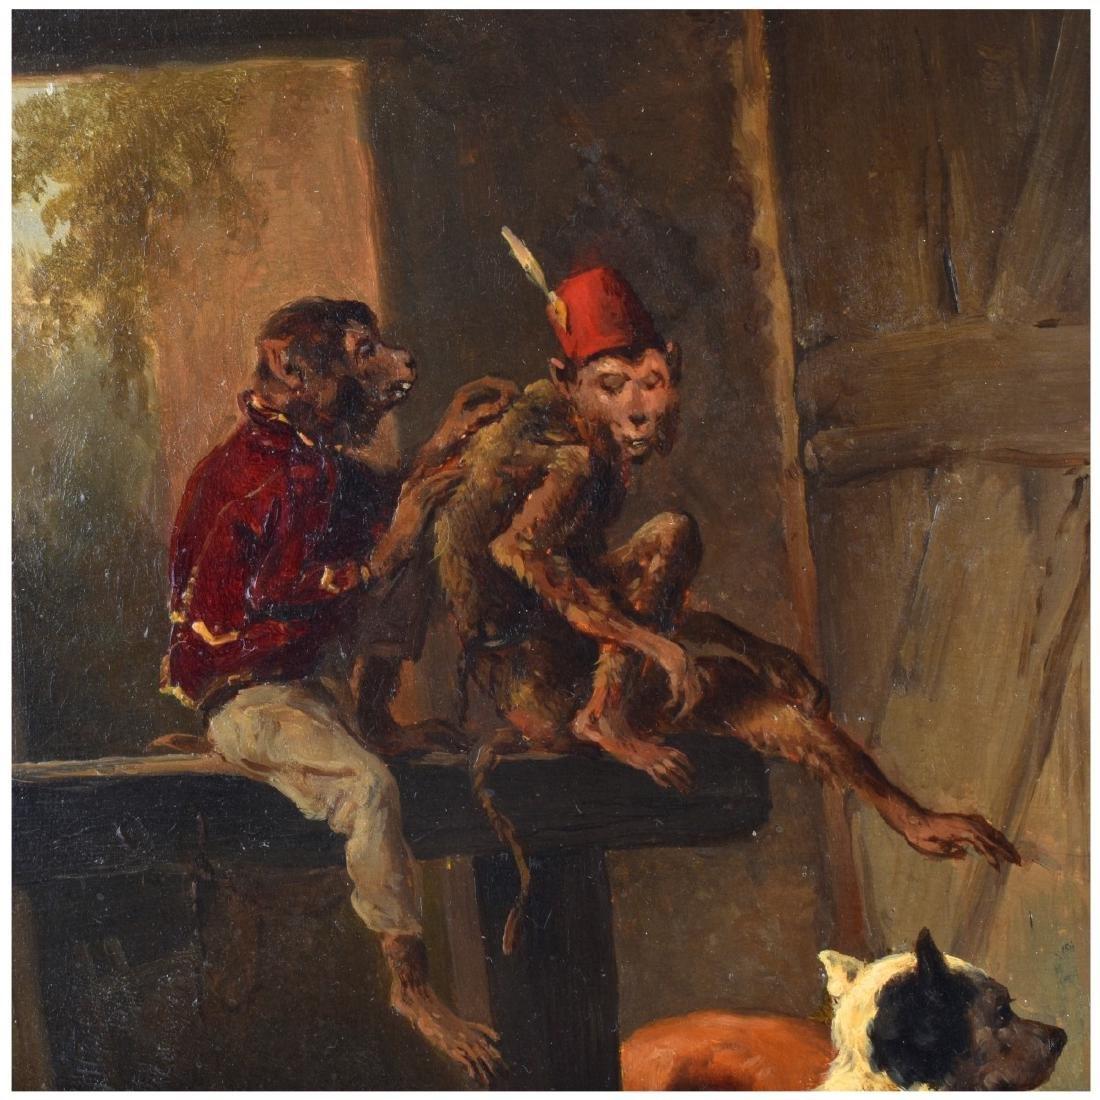 Wouterus Verschuur I, Dutch (1812 - 1874) O/P - 2